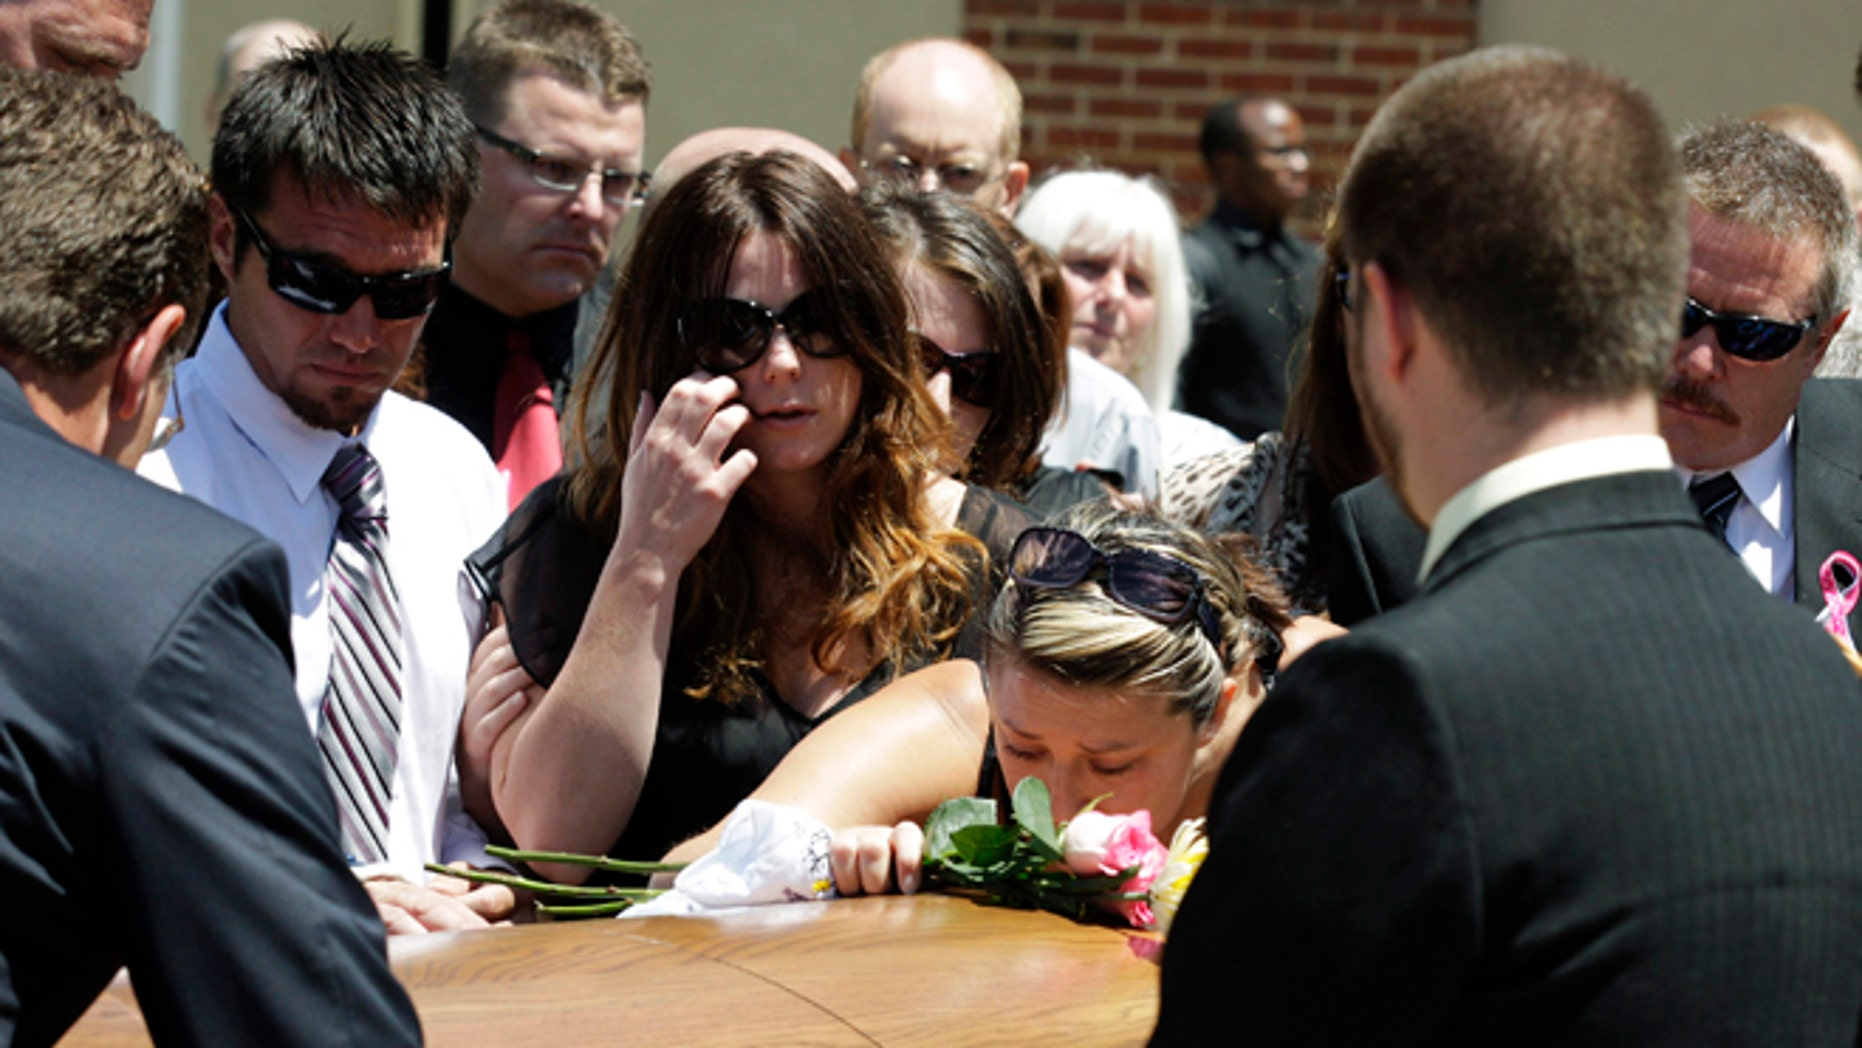 July 26, 2012: Amanda Medek, center left, looks on as her cousin Amber Vigil, center right, kisses the casket of Amanda's sister Micayla Medek, following Micayla's funeral in Denver.